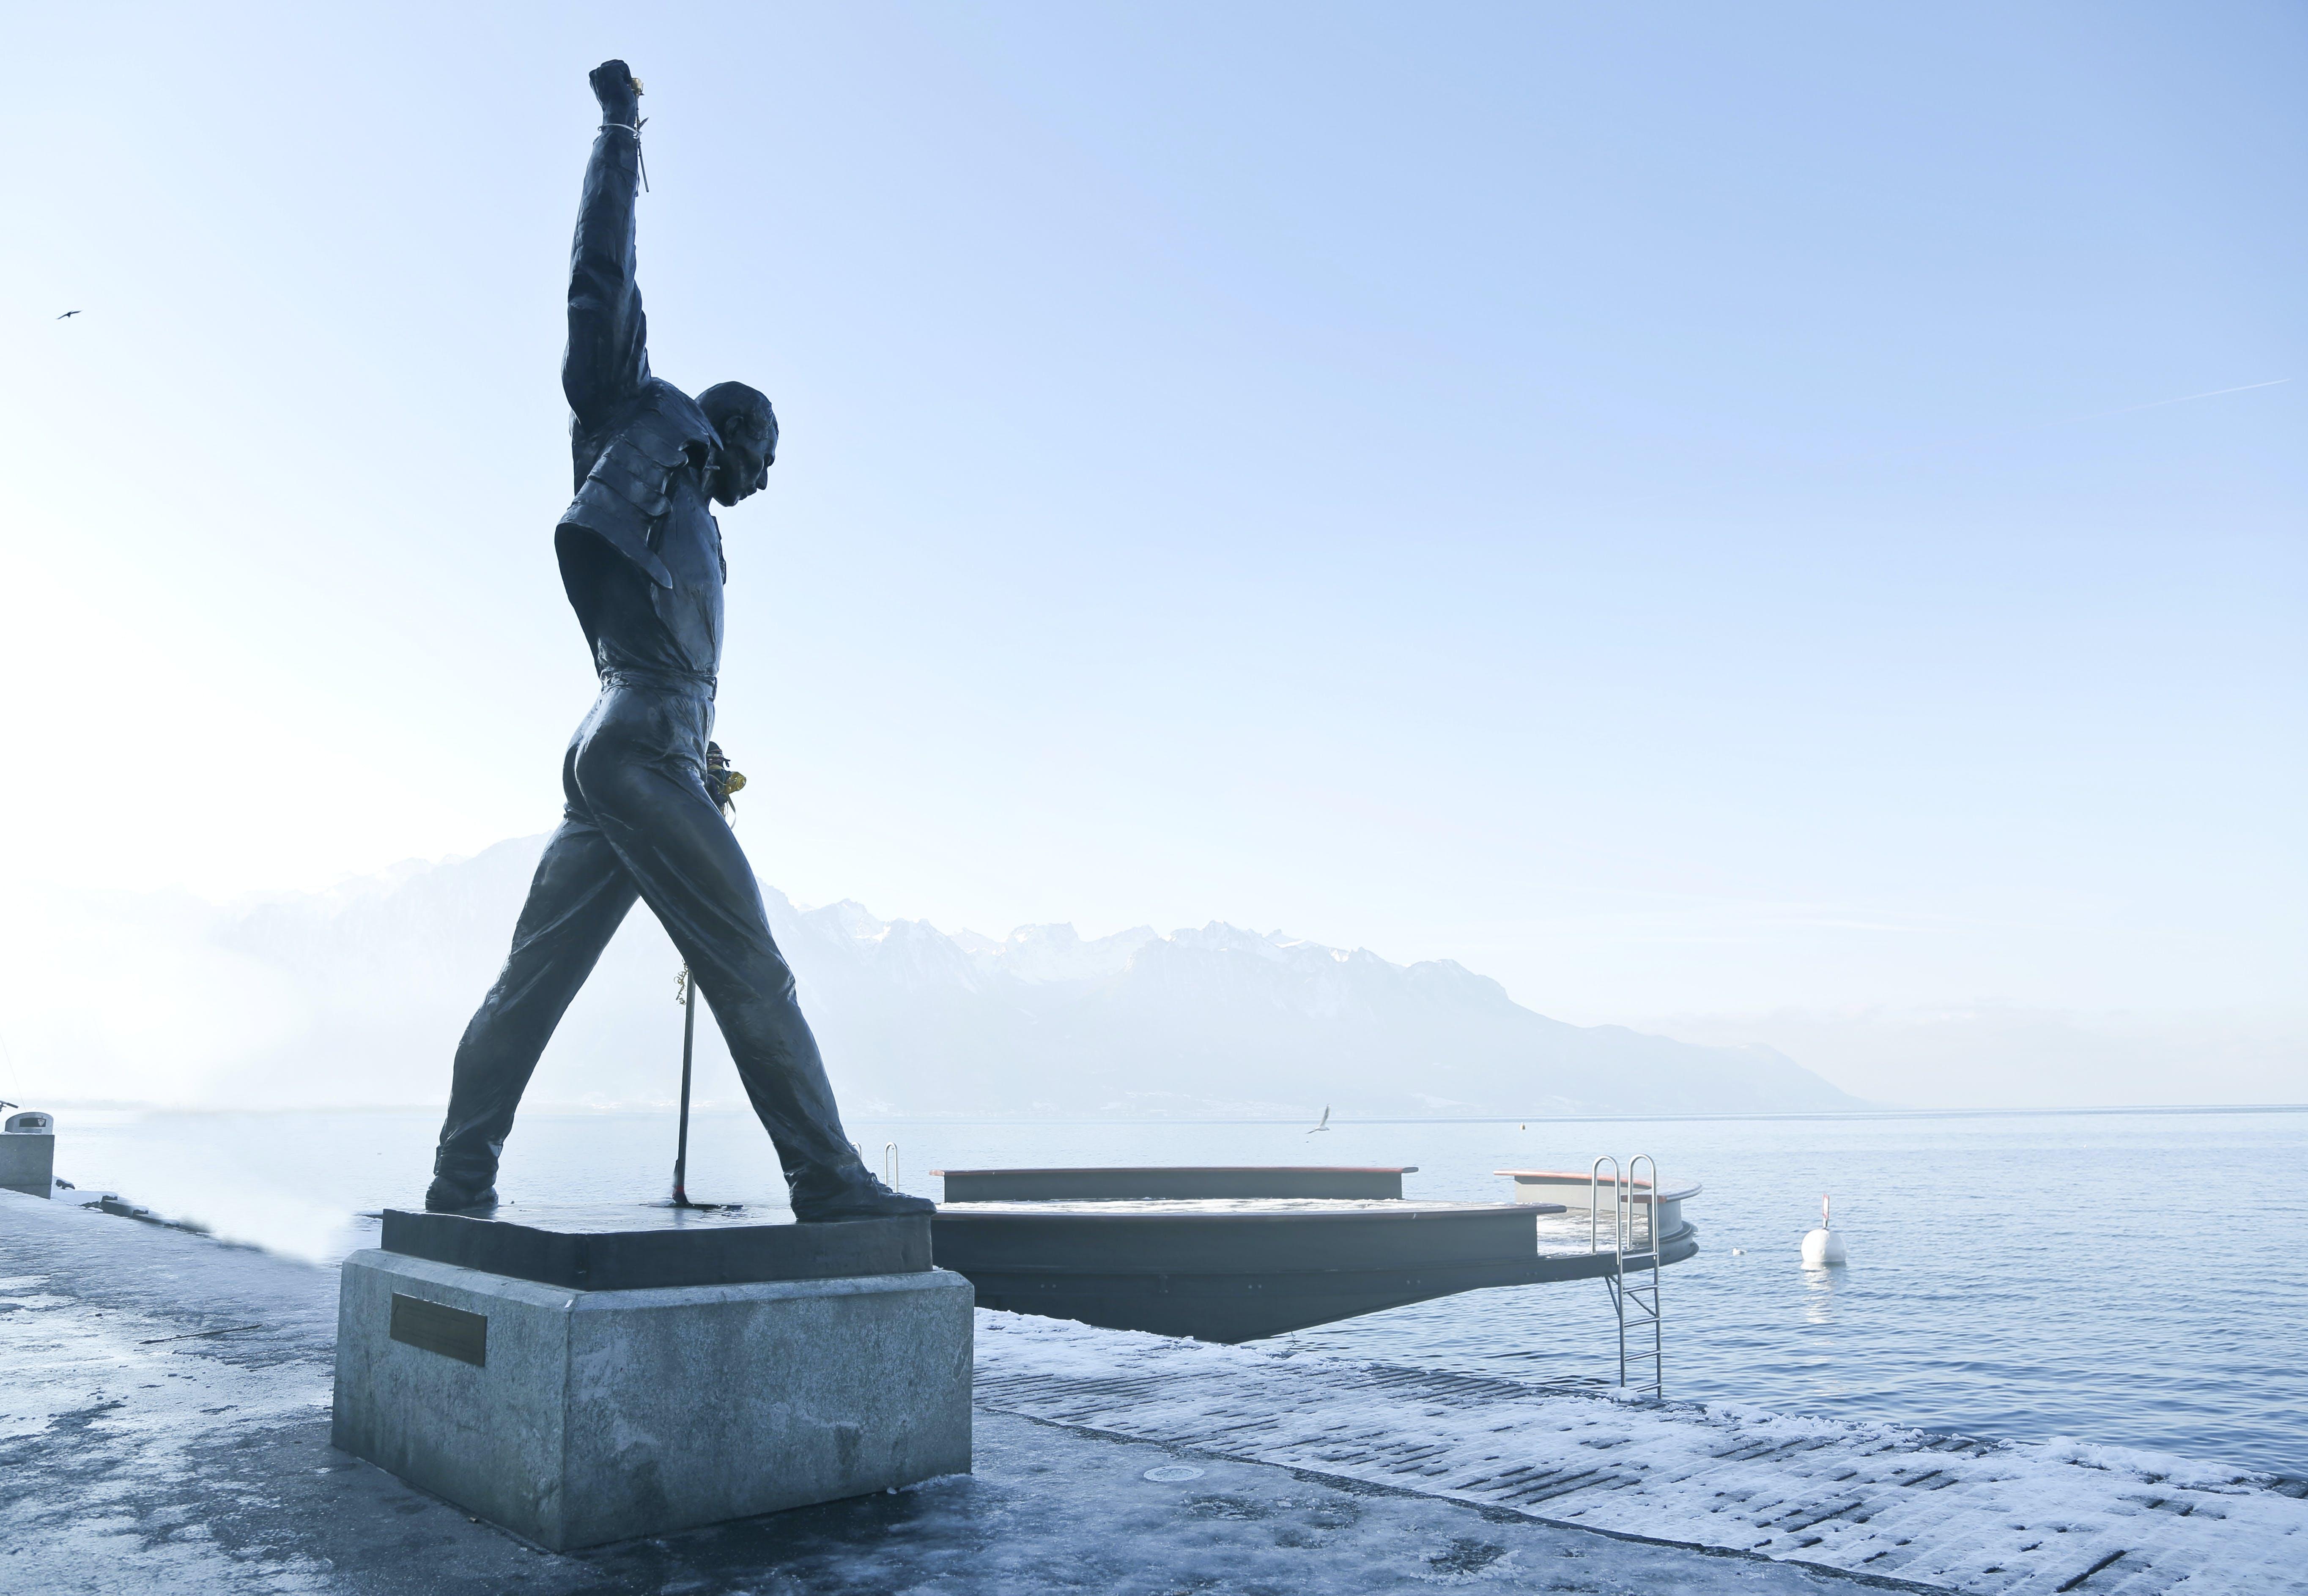 Gray Metal Statue of Man Raising Hand Near Dock